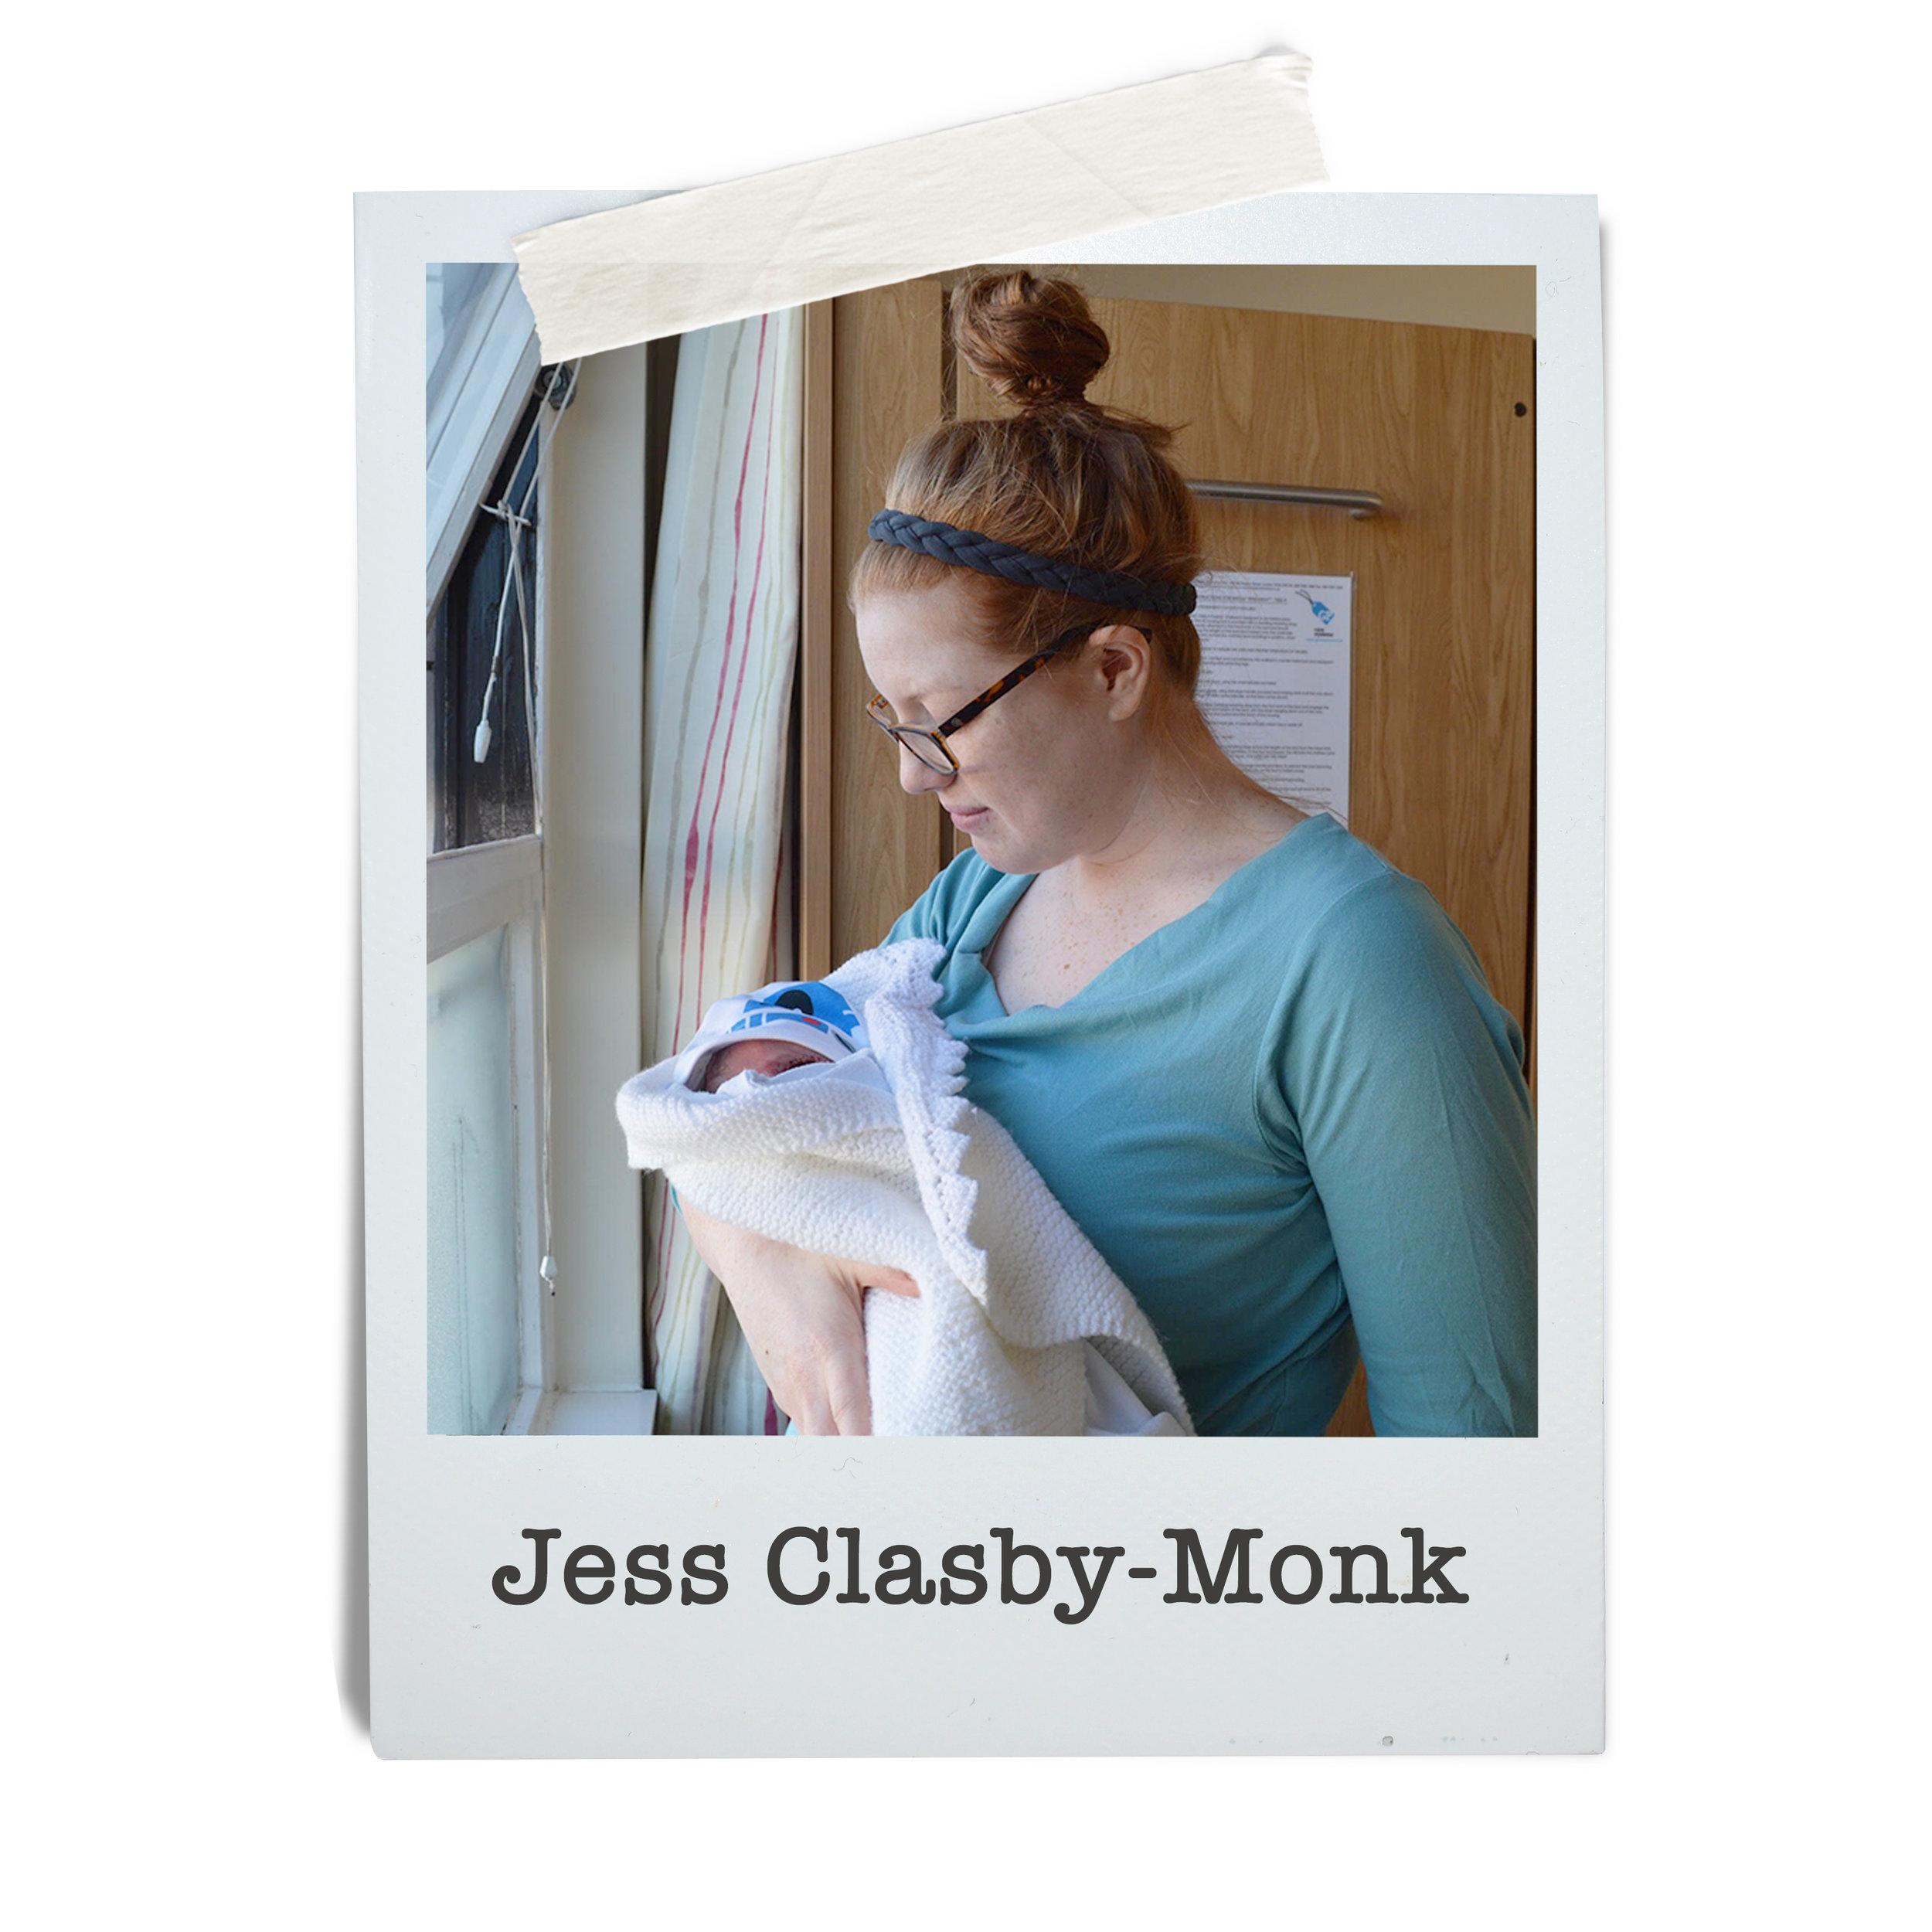 Jess Clasby-Monk